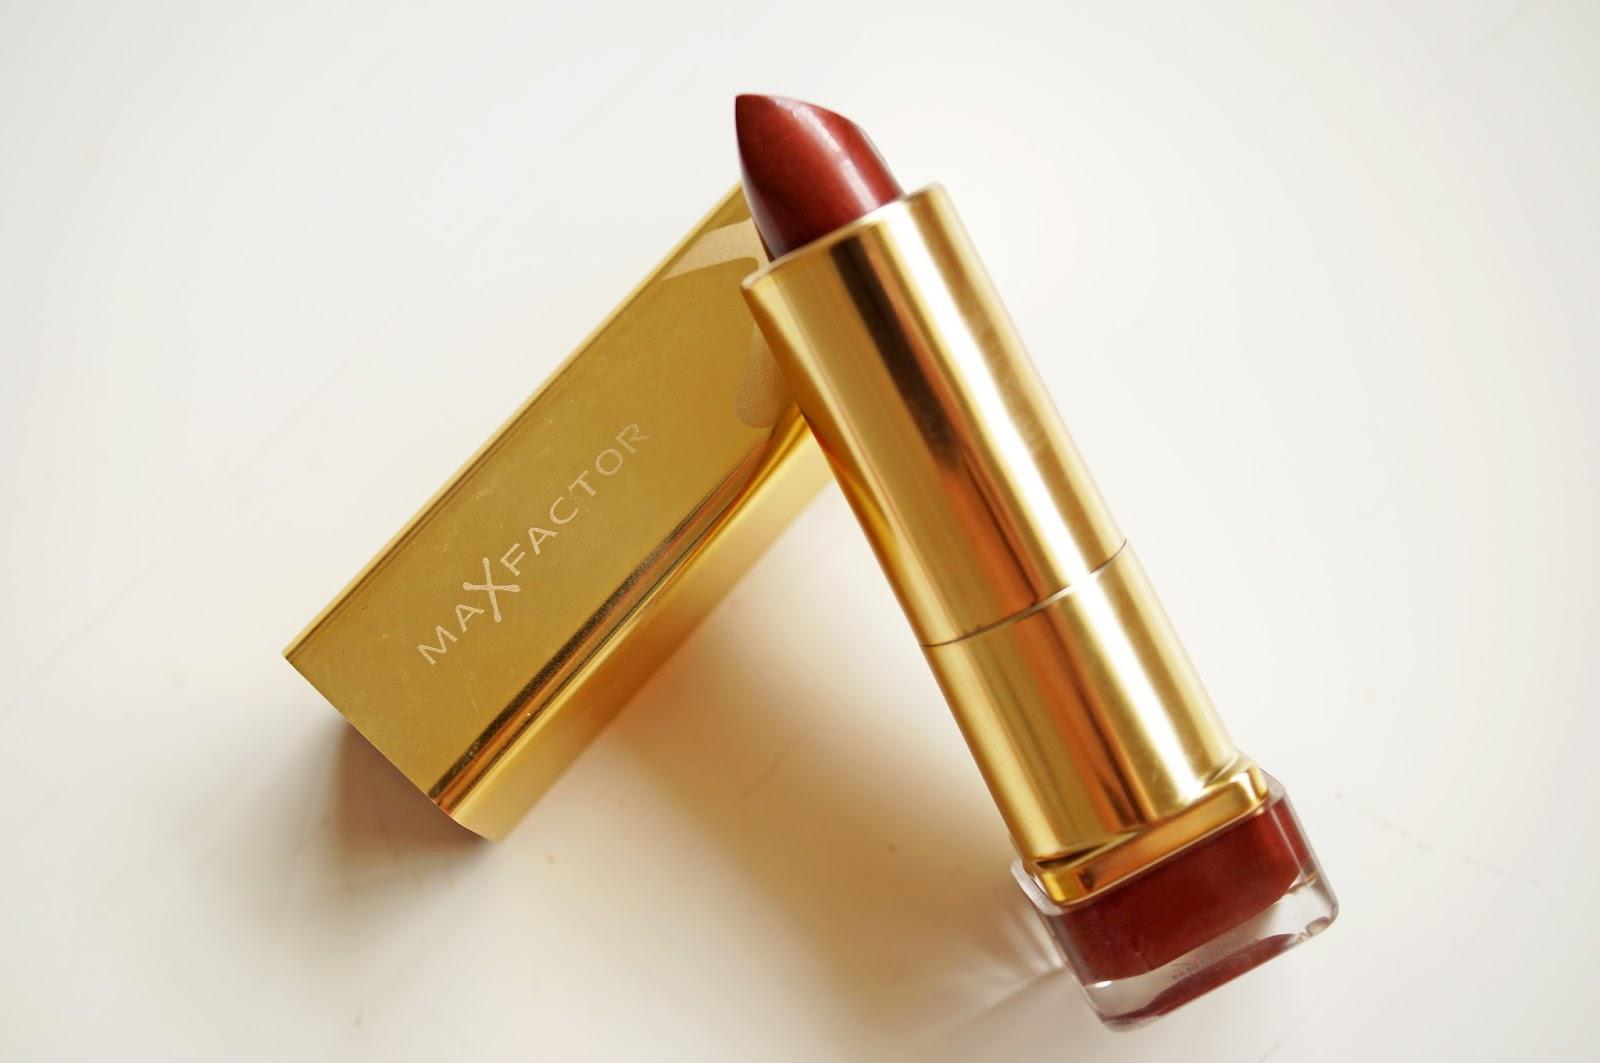 Max Factor Bronze Lipstick